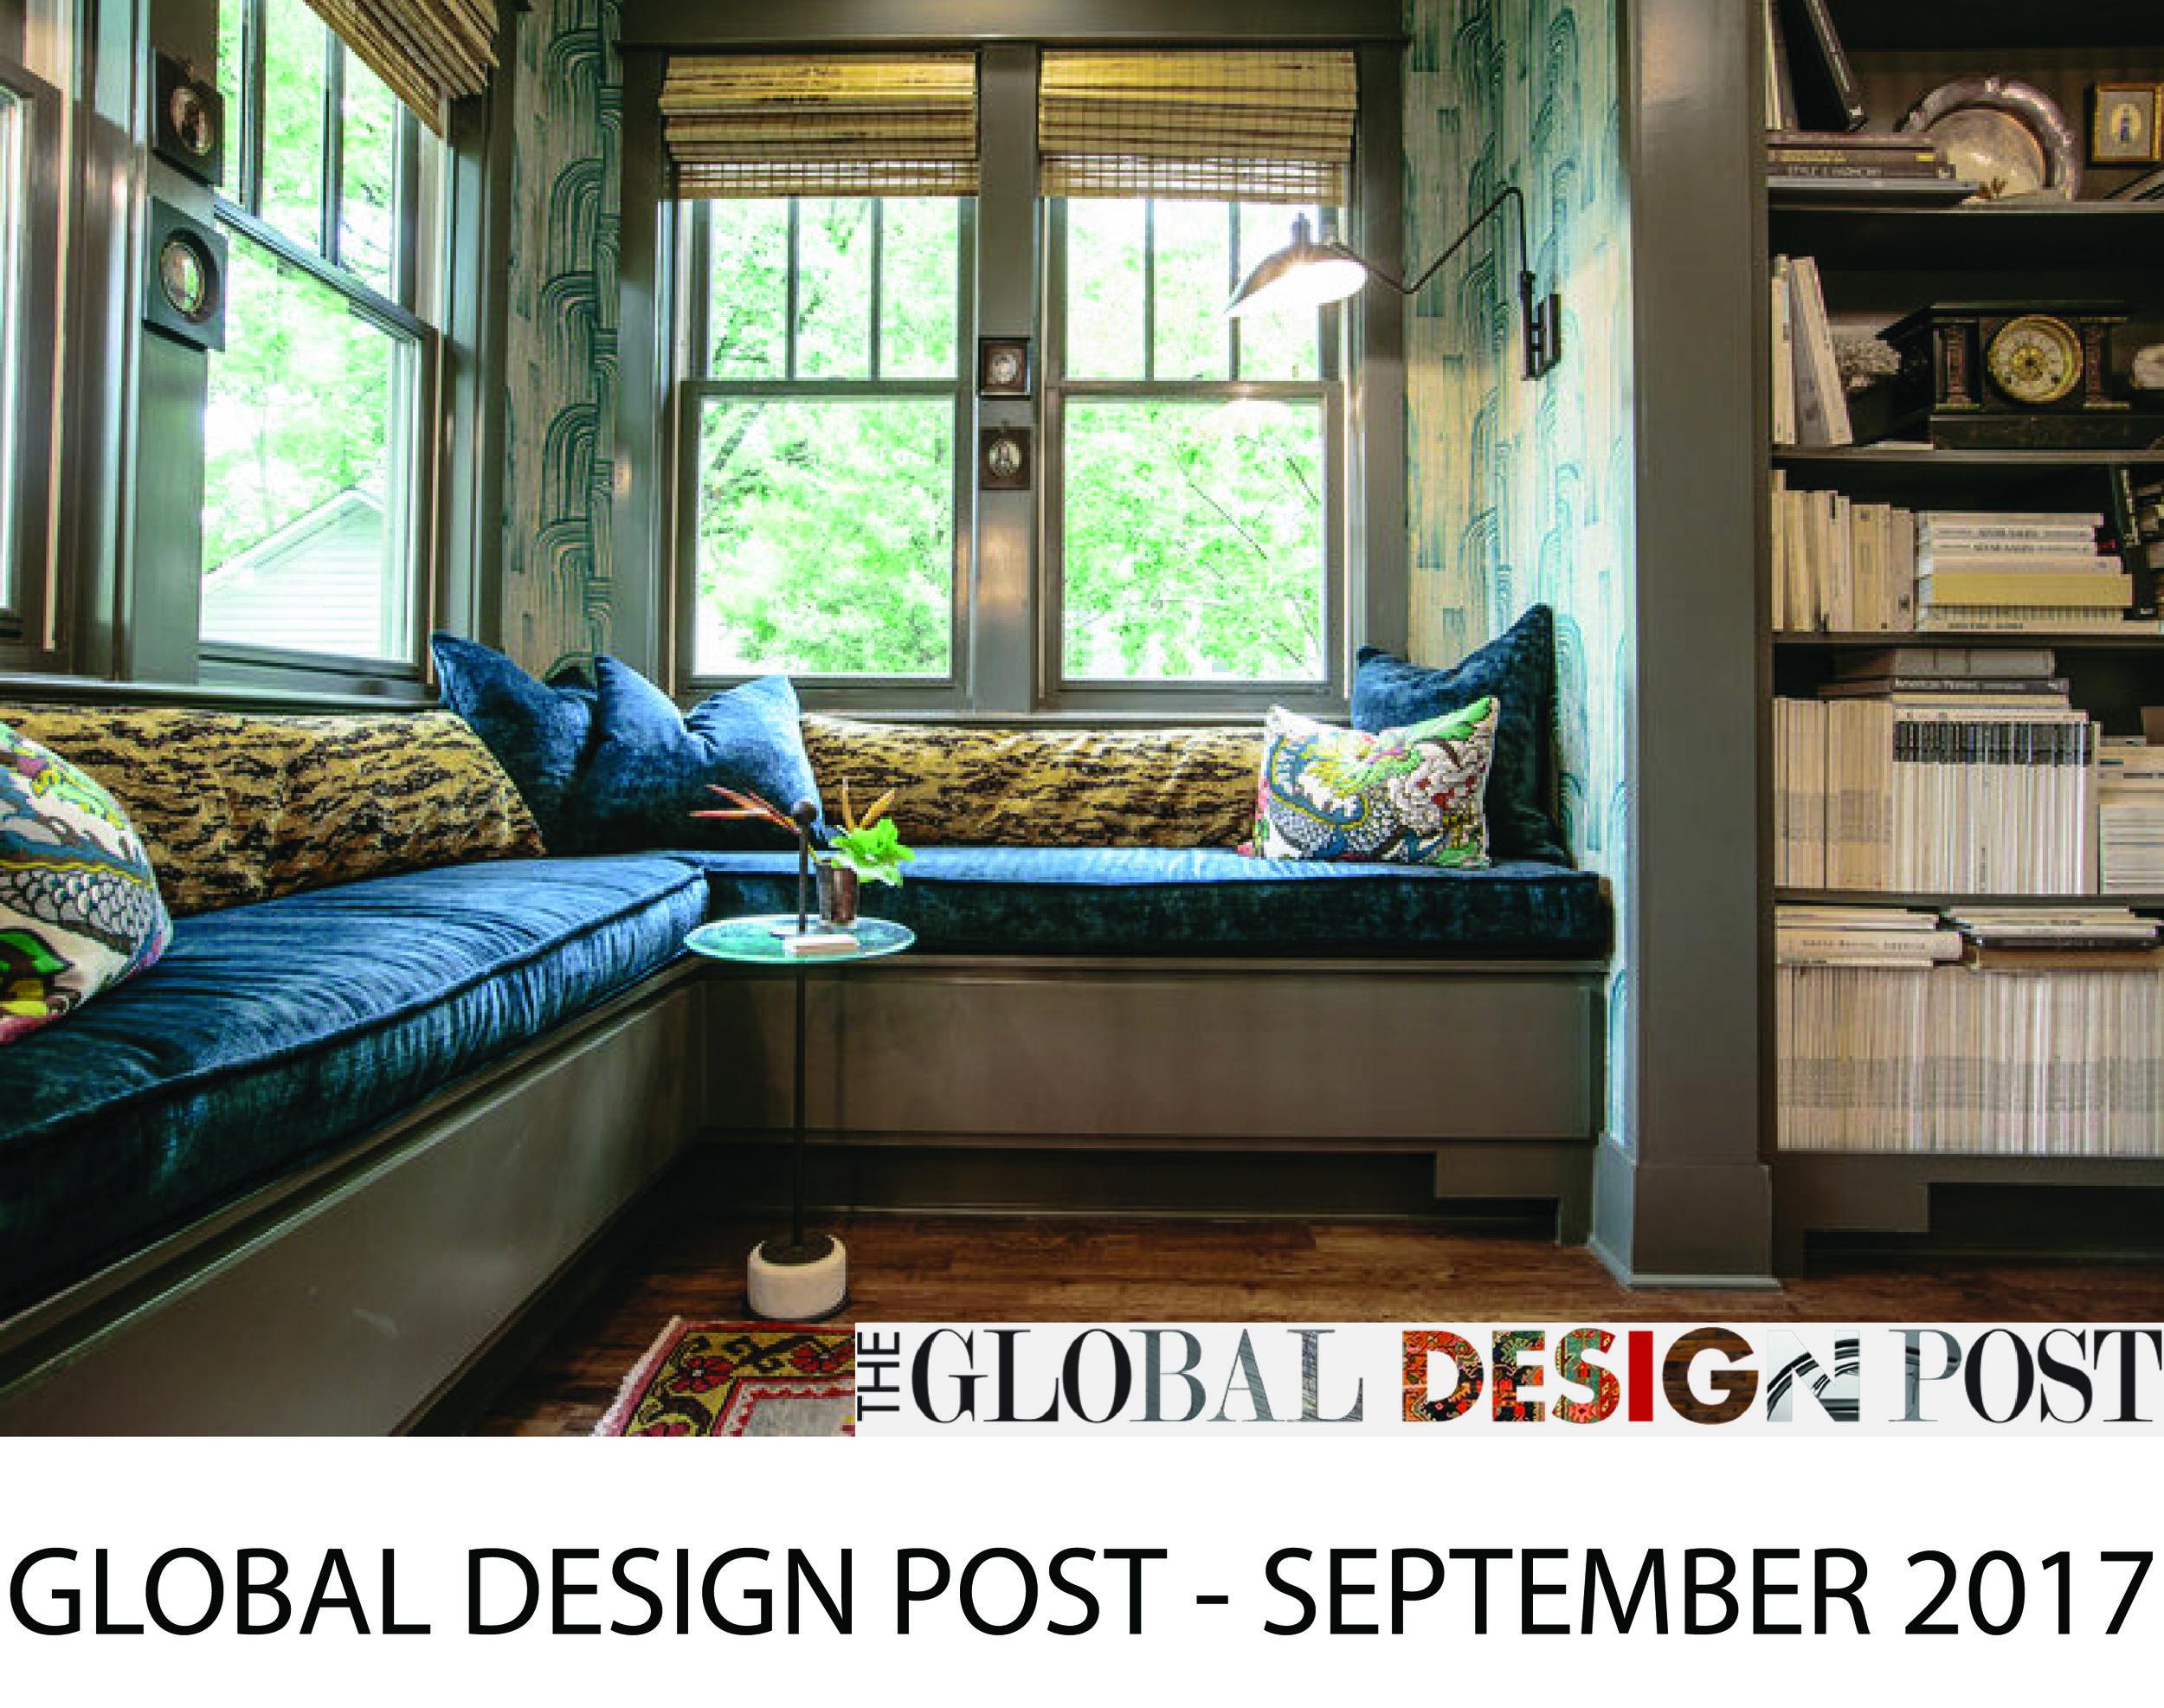 globaldesignpostk7-01.jpg